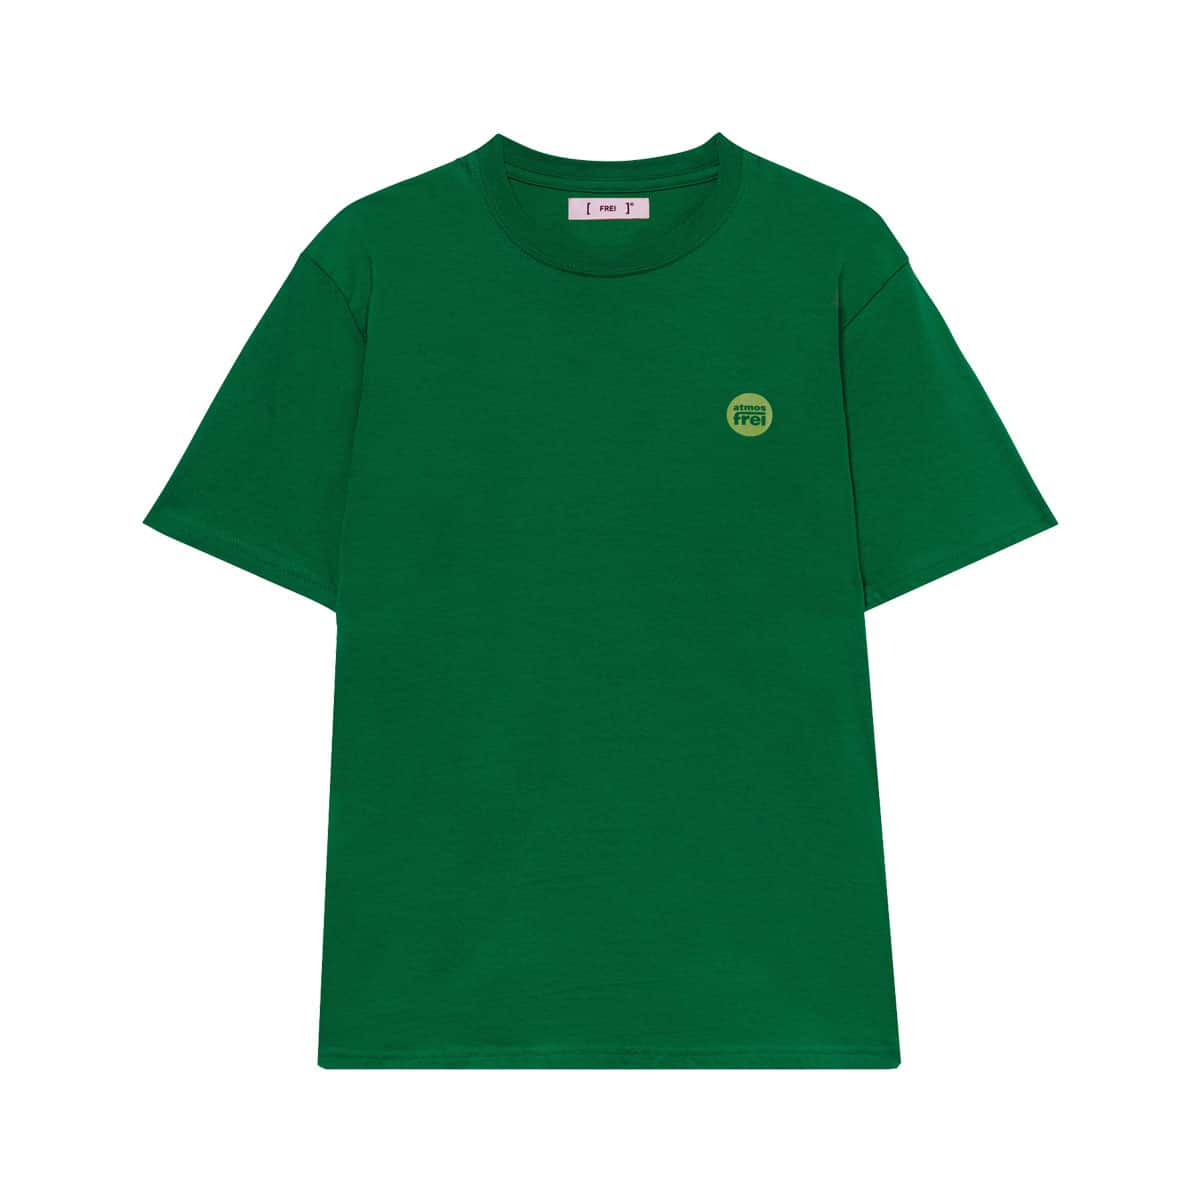 FREI X ATMOS POSTER T-SHIRT Green 20SU-I_photo_large